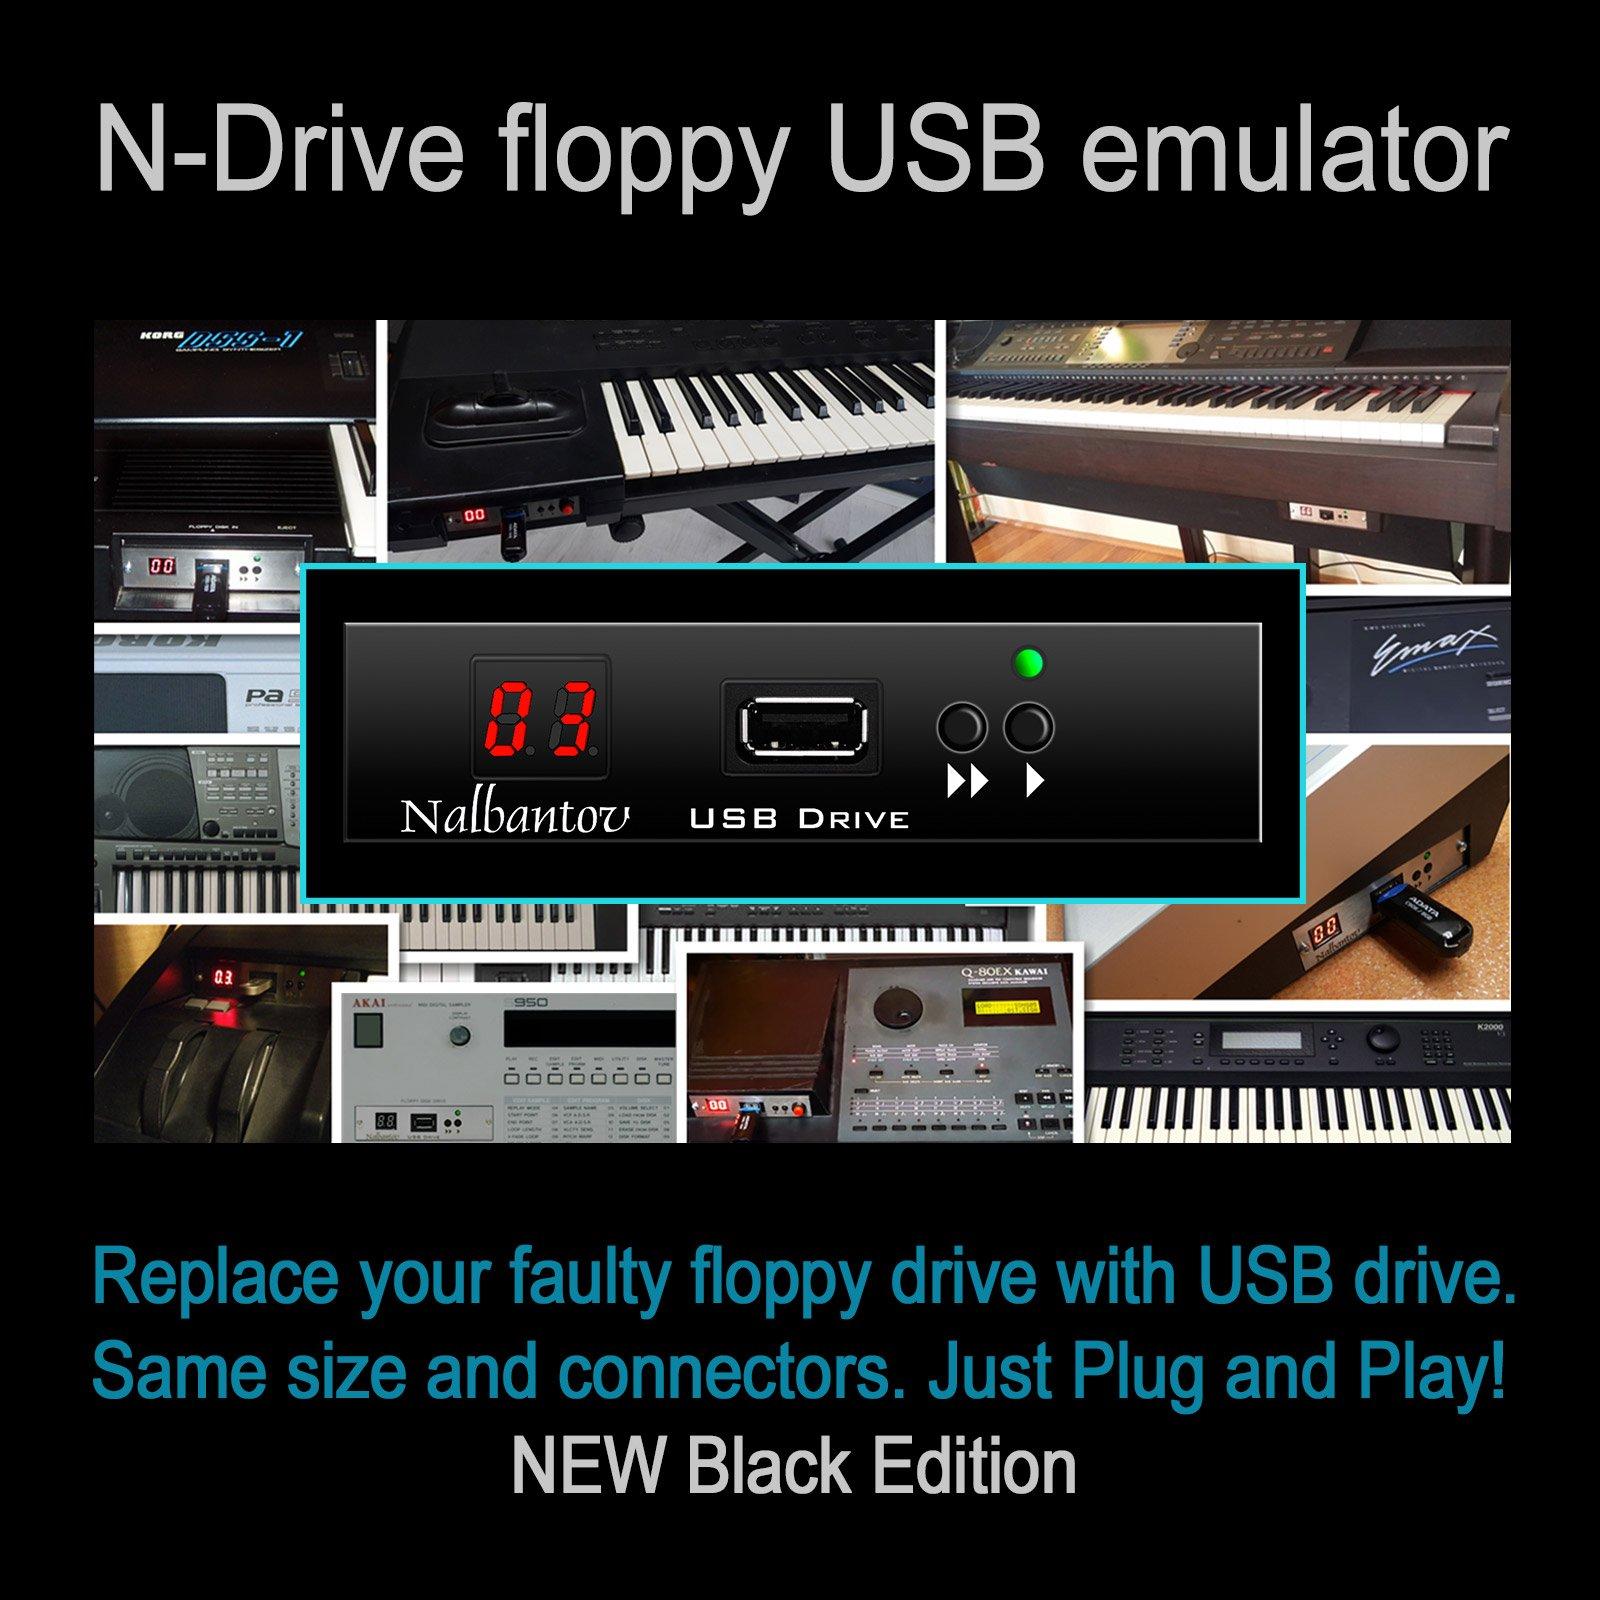 Nalbantov USB Floppy Disk Drive Emulator for Ensoniq SD-1 + OS 4.1 by Nalbantov Electronics (Image #1)